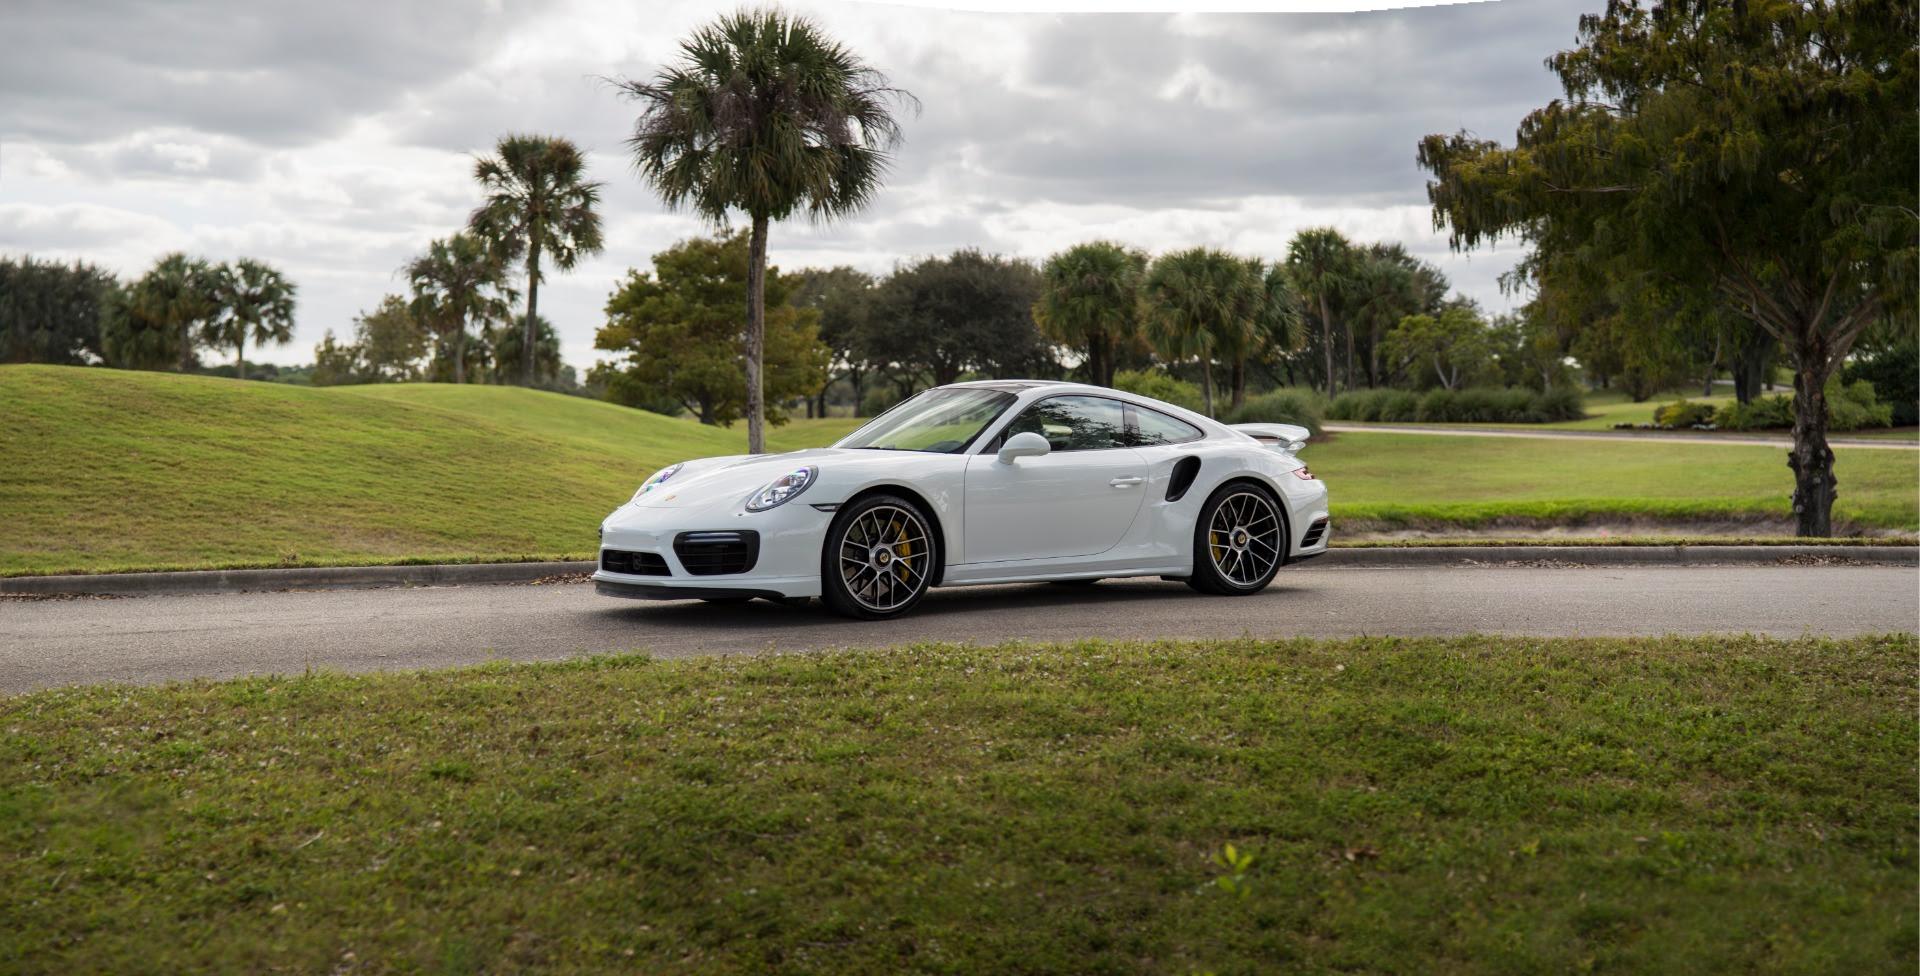 Used 2017 Porsche 911 Turbo S For Sale 179900 Marino